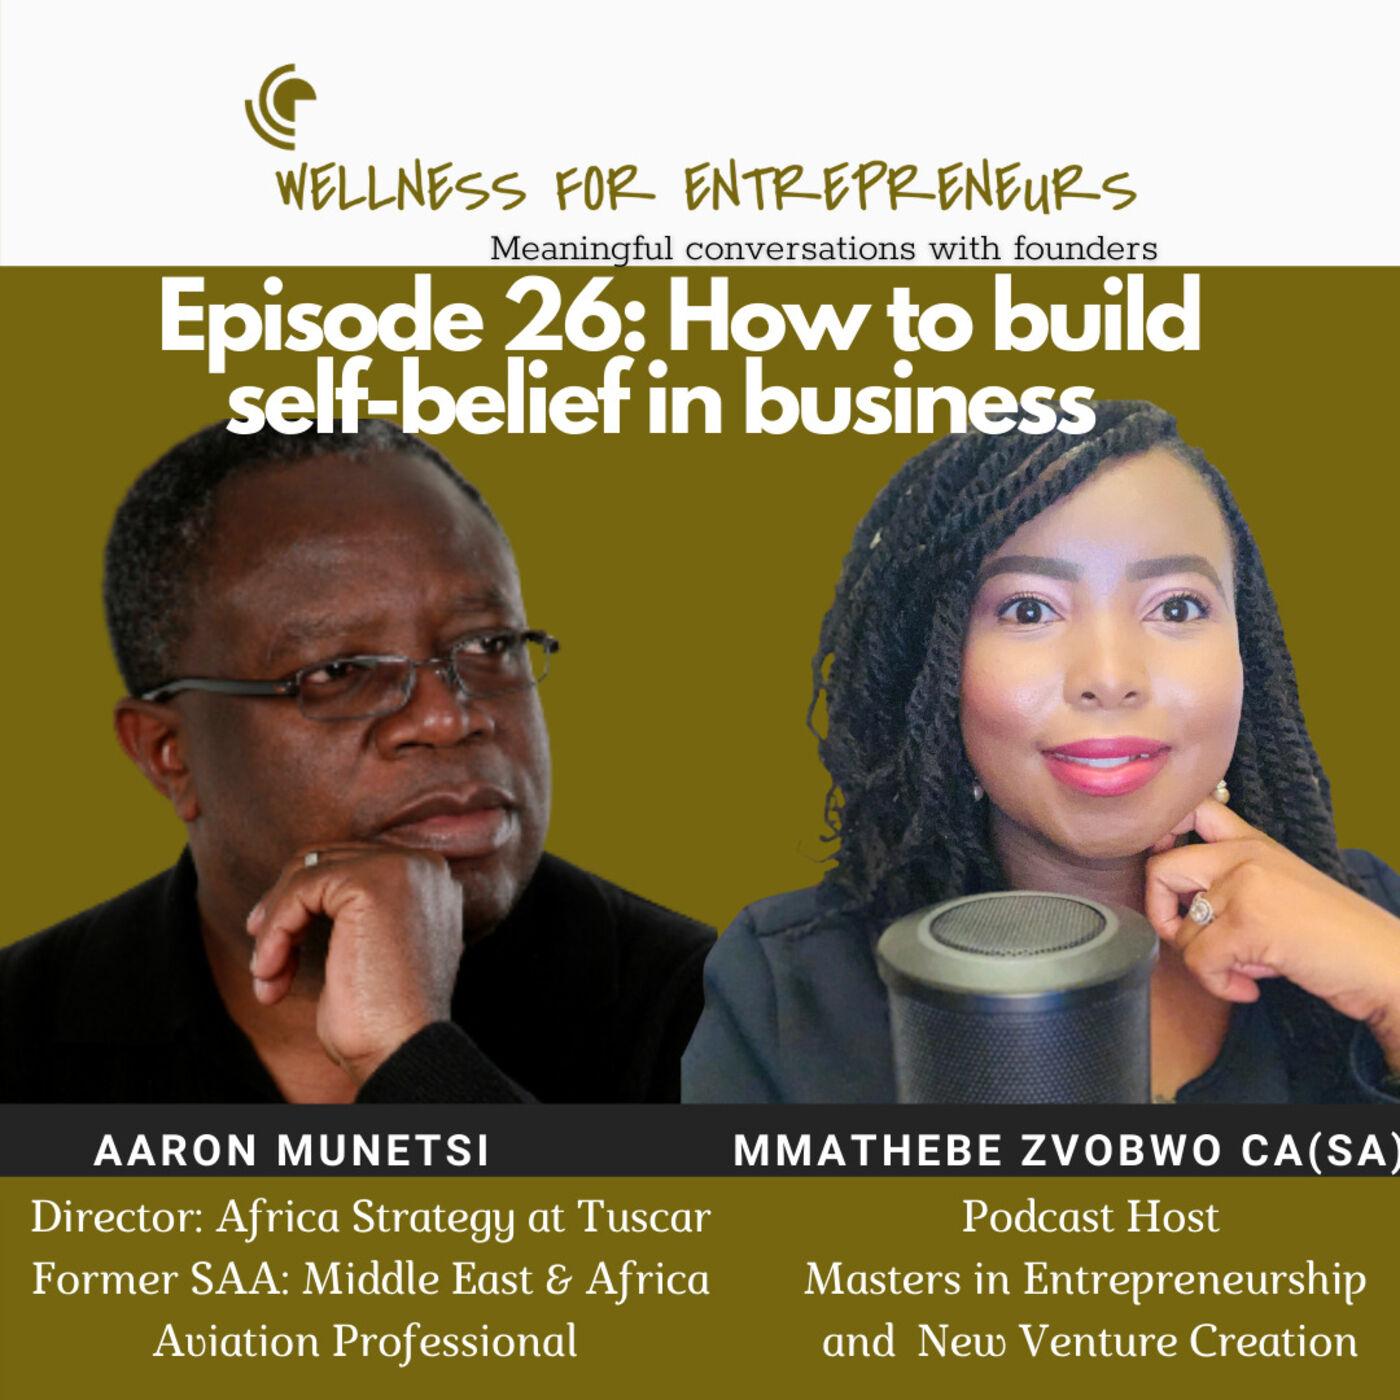 Episode 26: How to build self-belief in business, with Aaron Munetsi